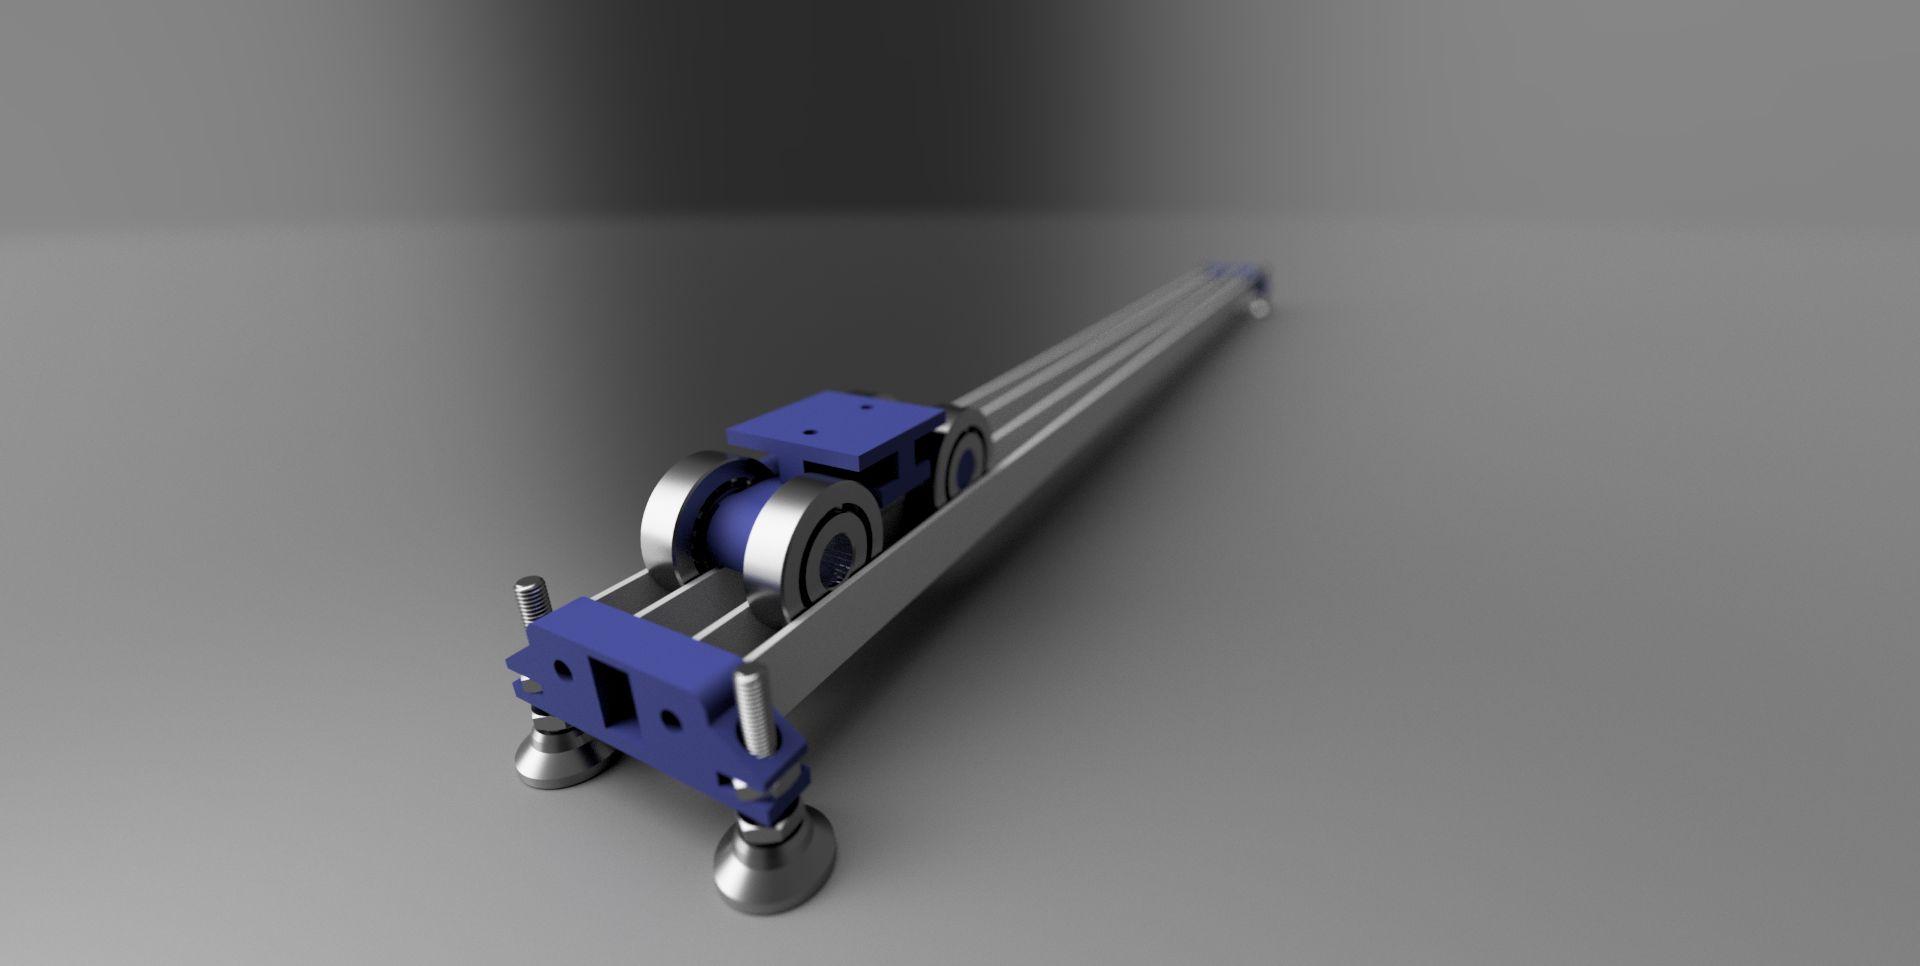 Camera-slide-rail-v7-4-3500-3500